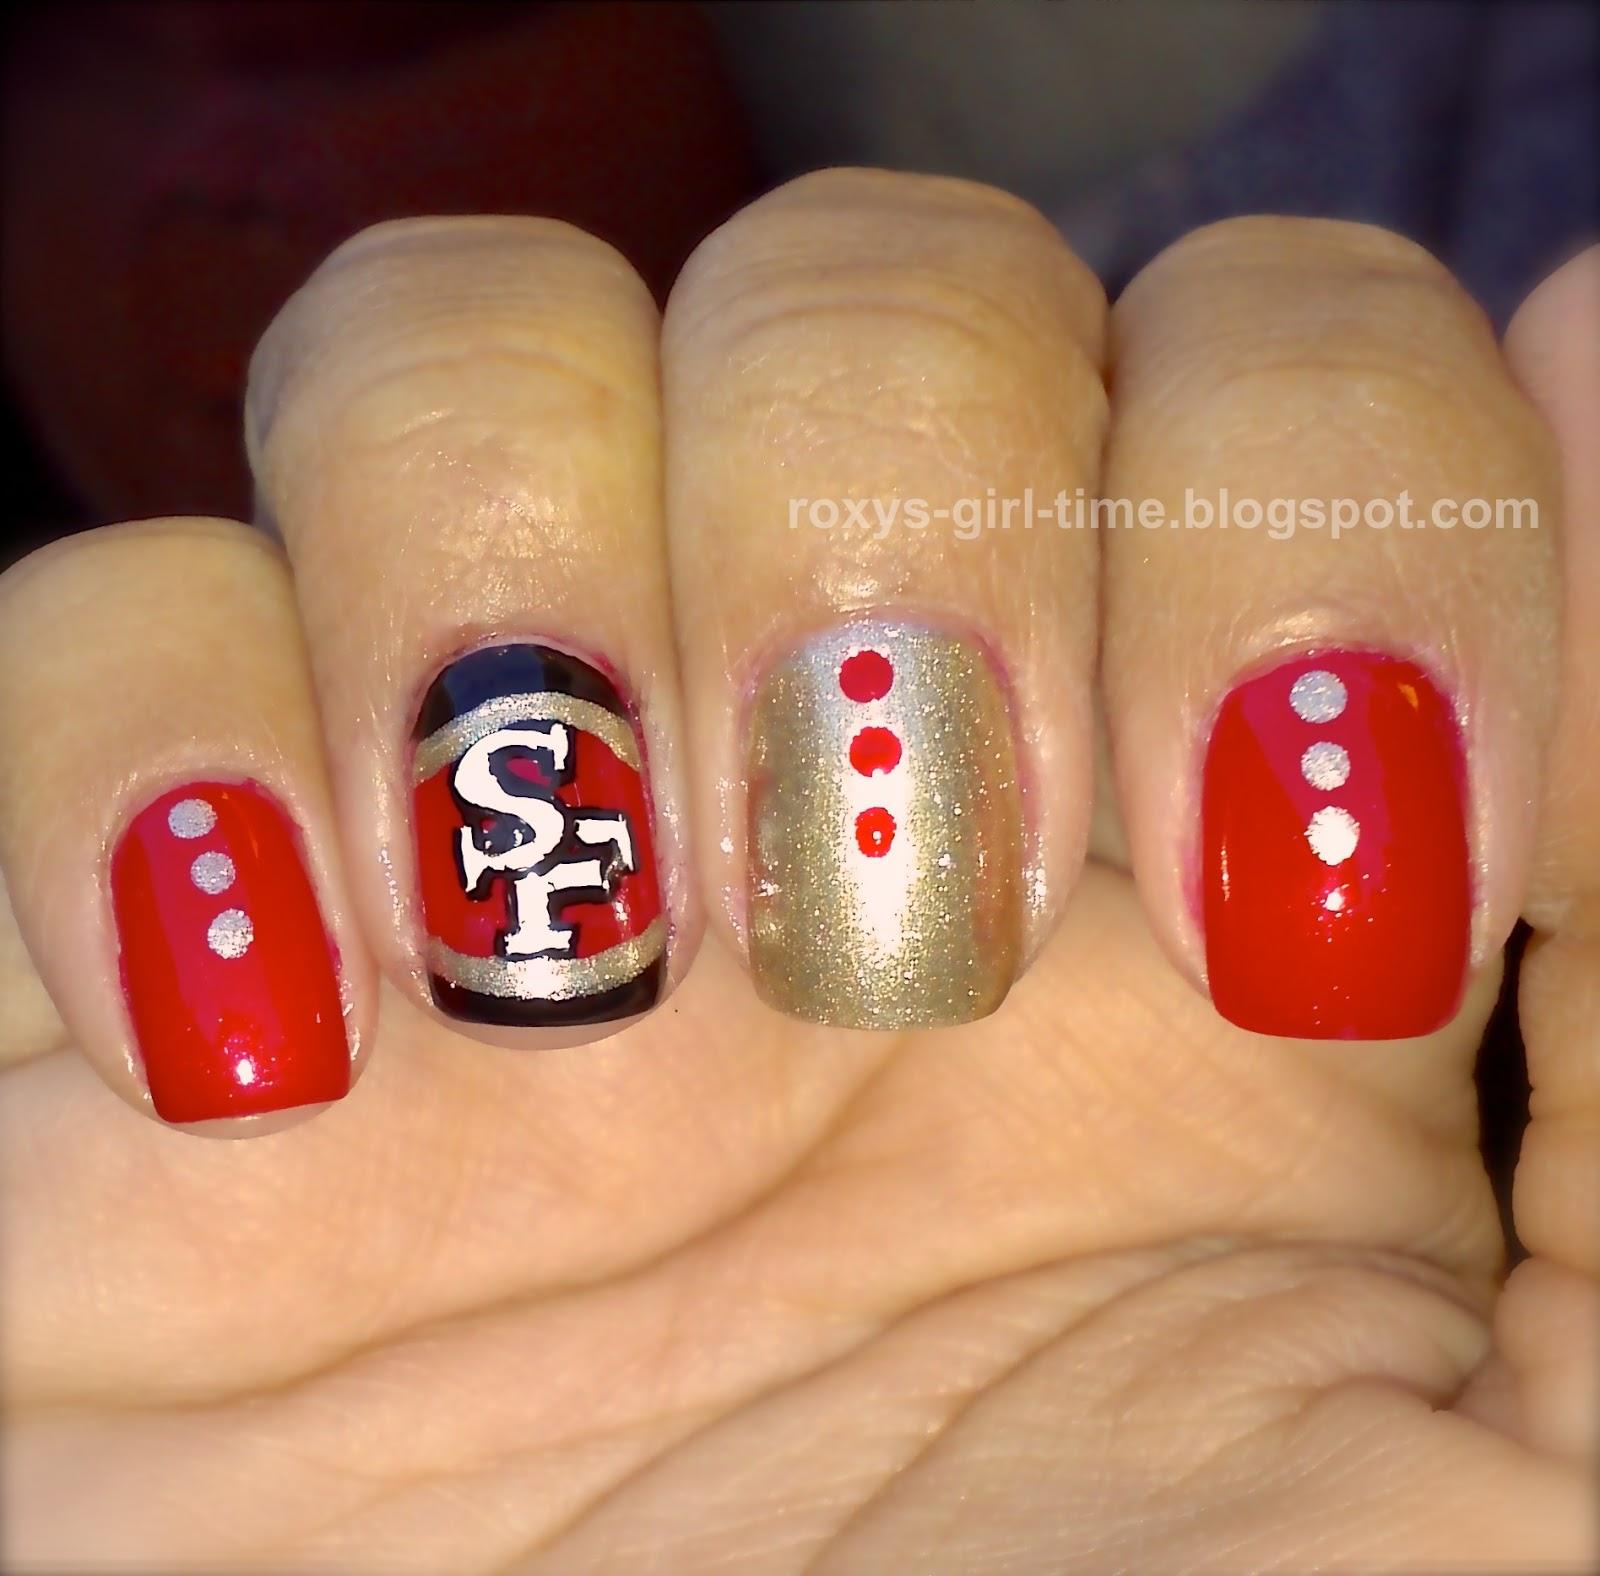 Roxys Girl Time Notd Sf 49ers Nail Art